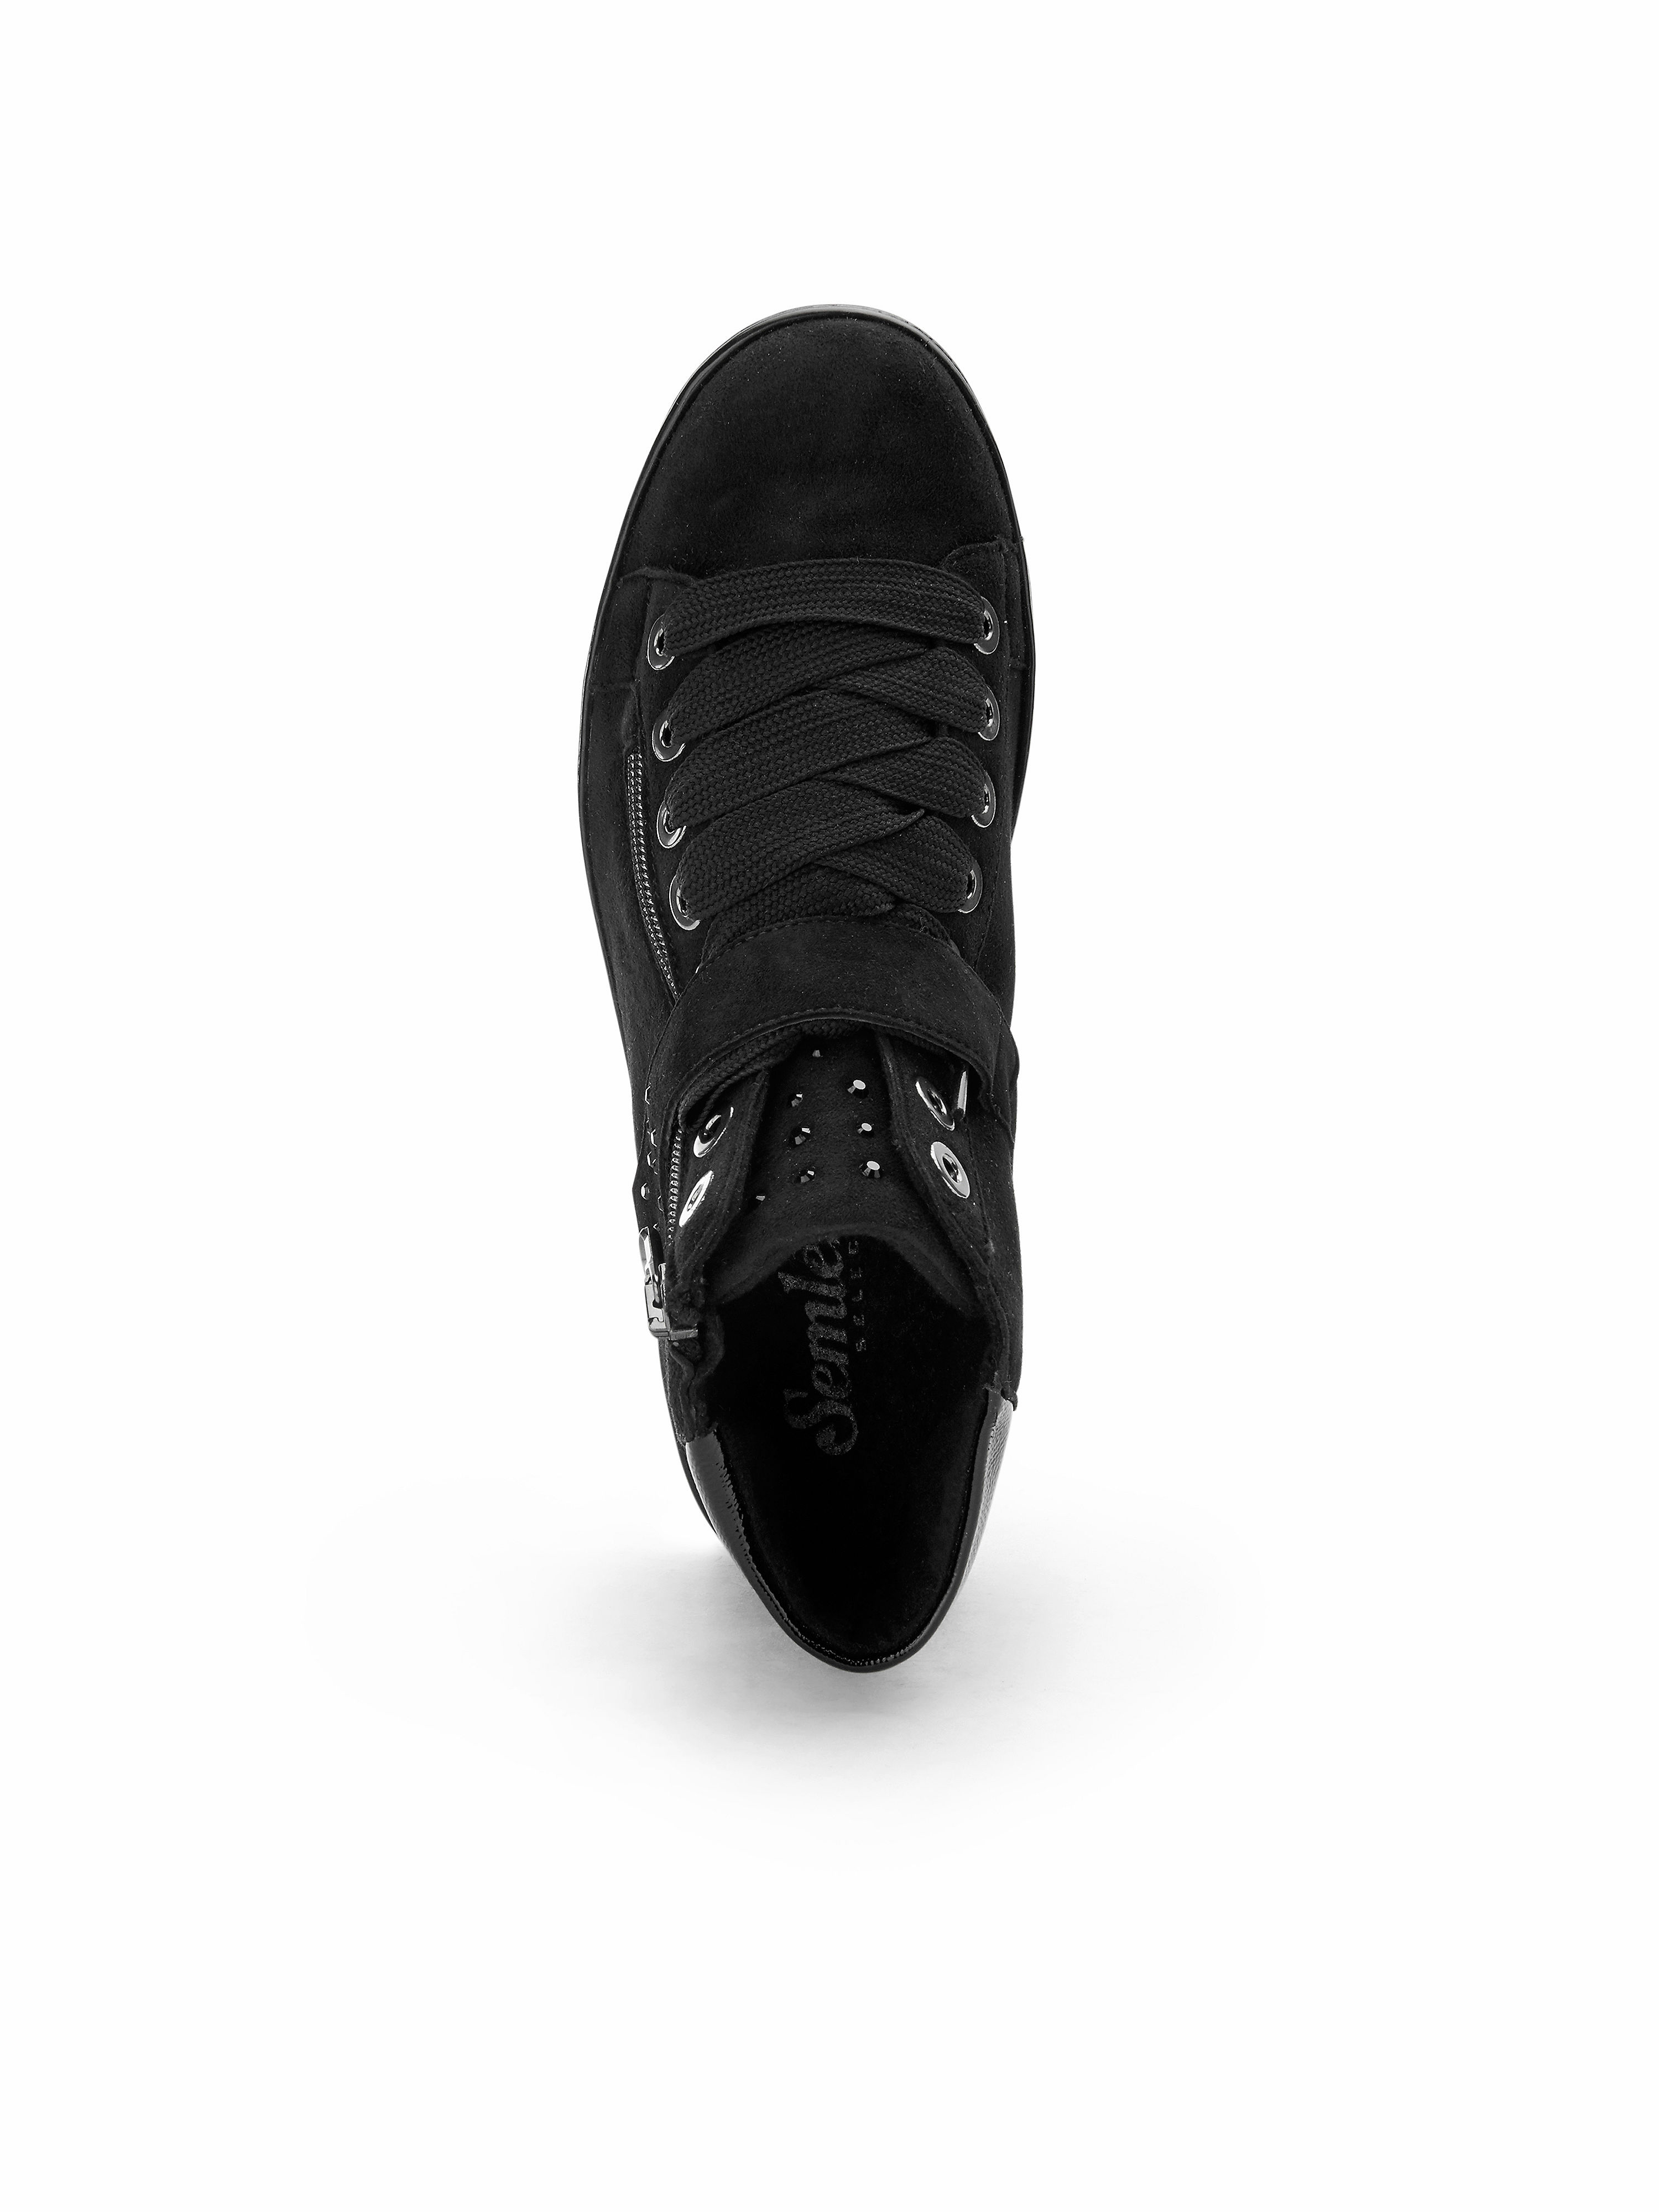 "Semler - Knöchelhoher Sneaker ""Ruby"" - Schwarz Gute Qualität Qualität Qualität beliebte Schuhe 15ce9e"